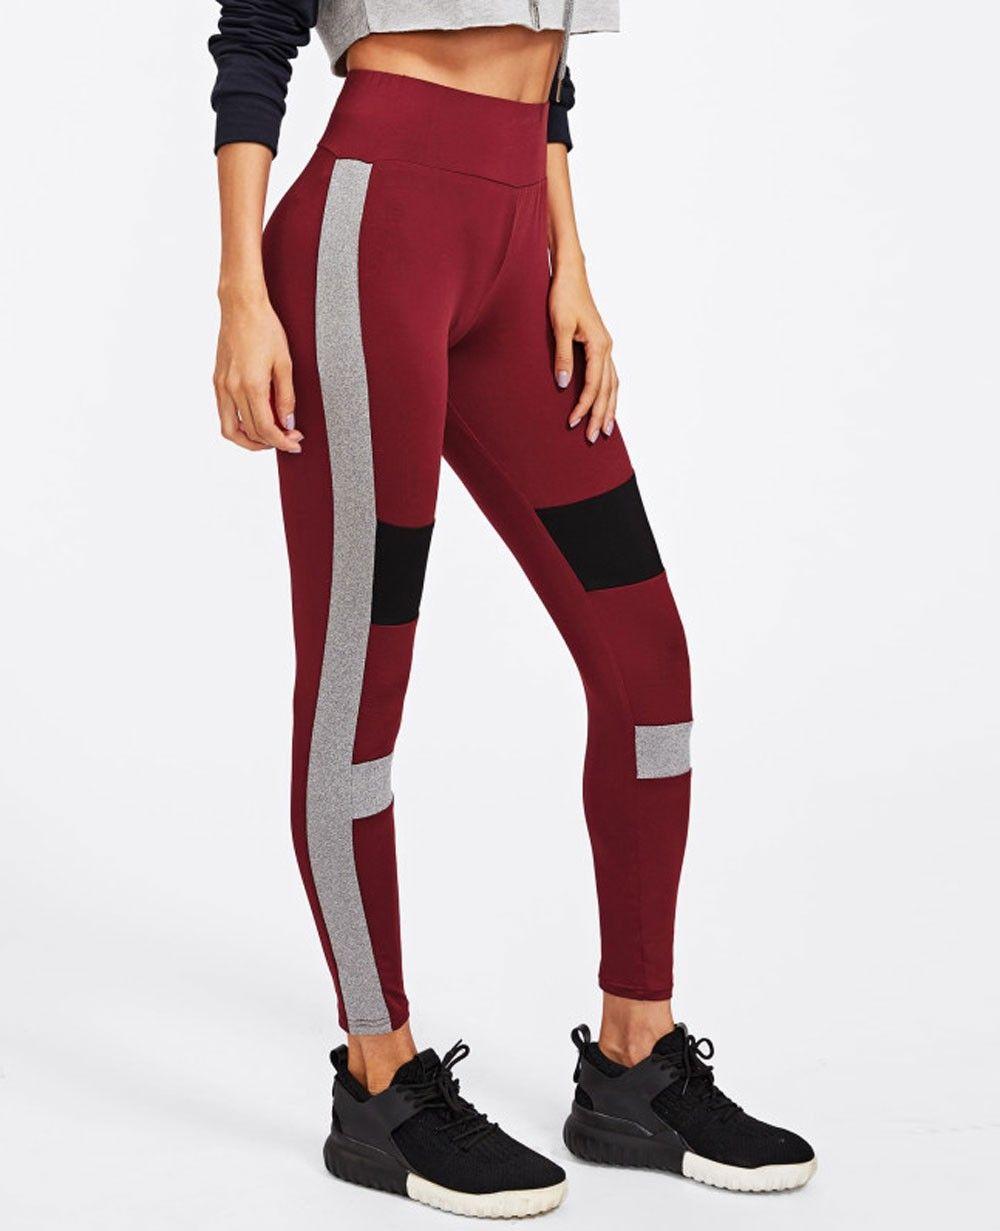 d521fc708008a Color Block Cut And Sew Leggings   Women Tights & Leggings in 2019 ...